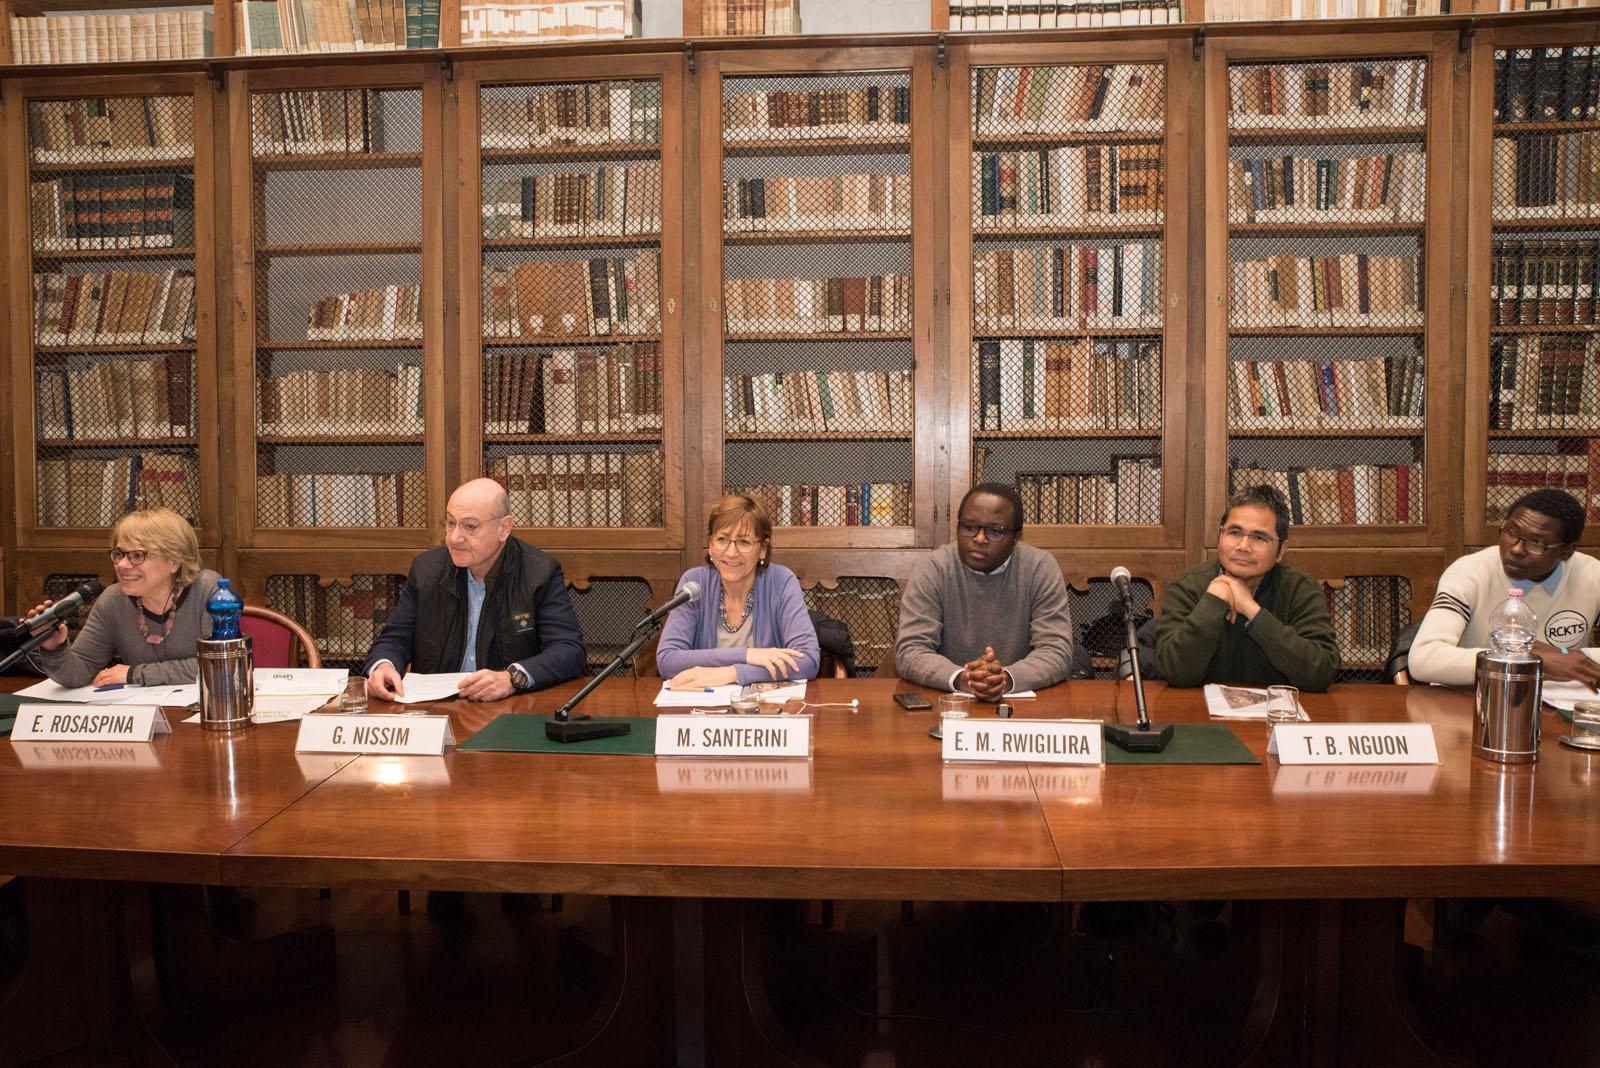 con Elisabetta Rosaspina, Milena Santerini, Gabriele Nissim, Eugène Muhire Rwigilira, Tho Bovannrith Nguon, Abbas Ismail Mohamed